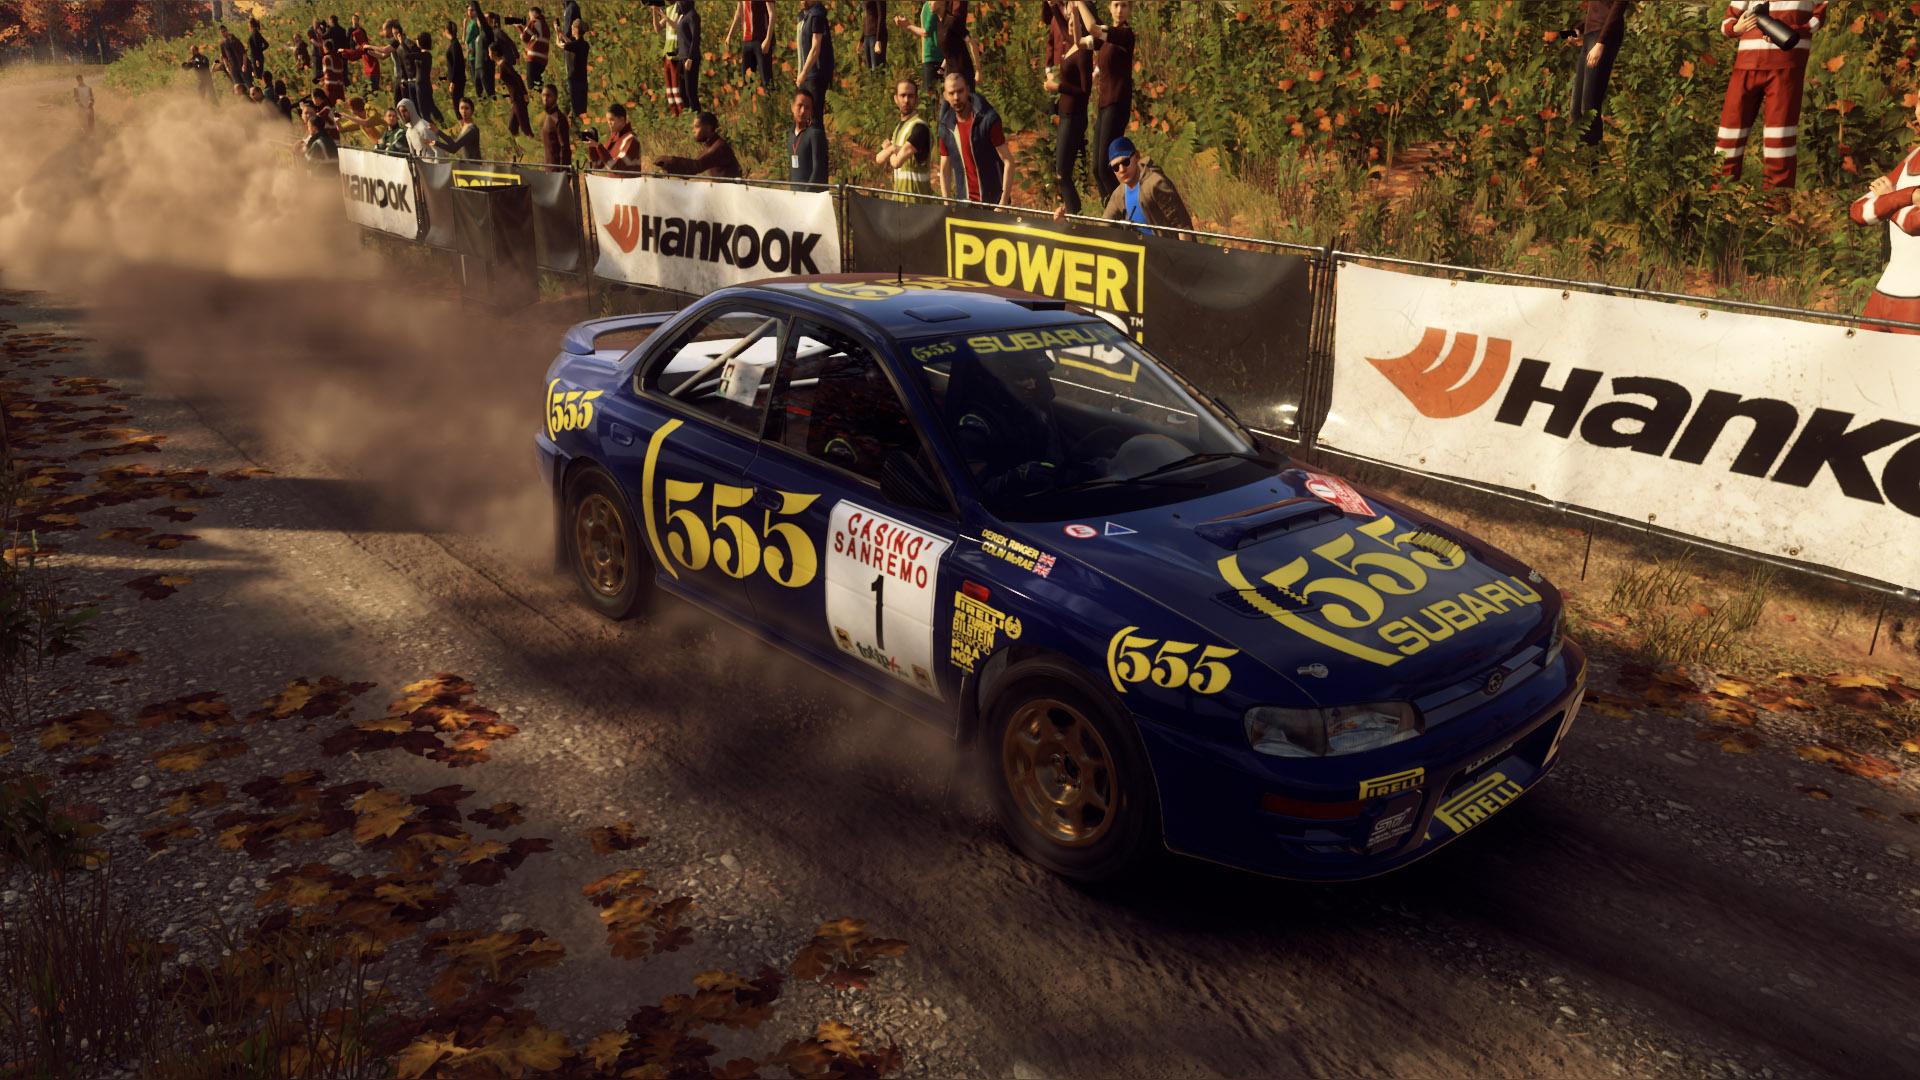 Subaru_Impreza_1996_03.jpg